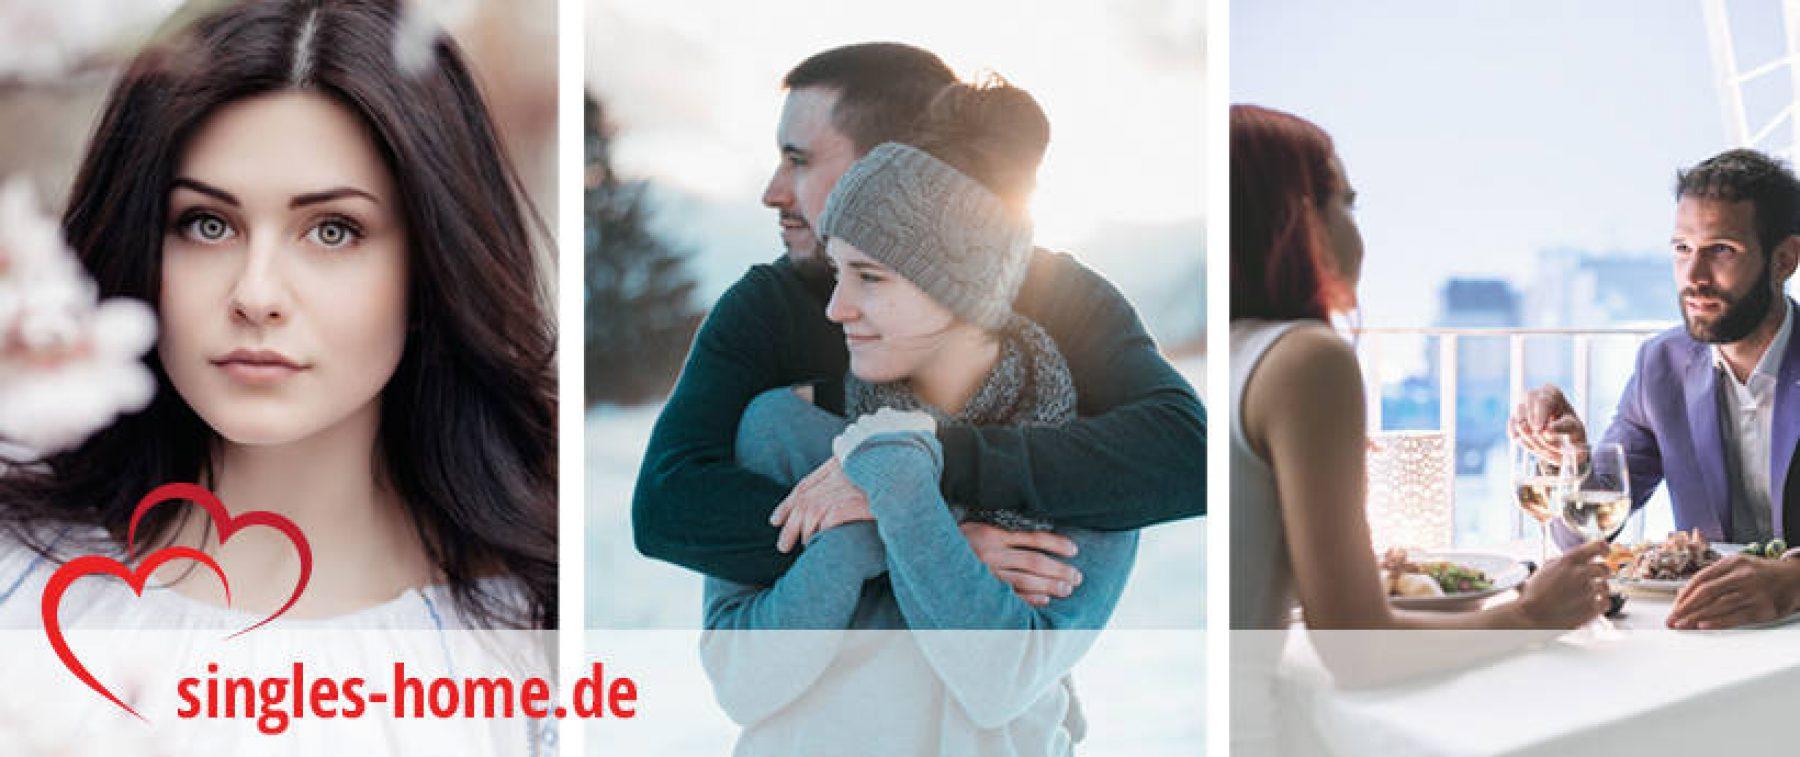 singles-home.de